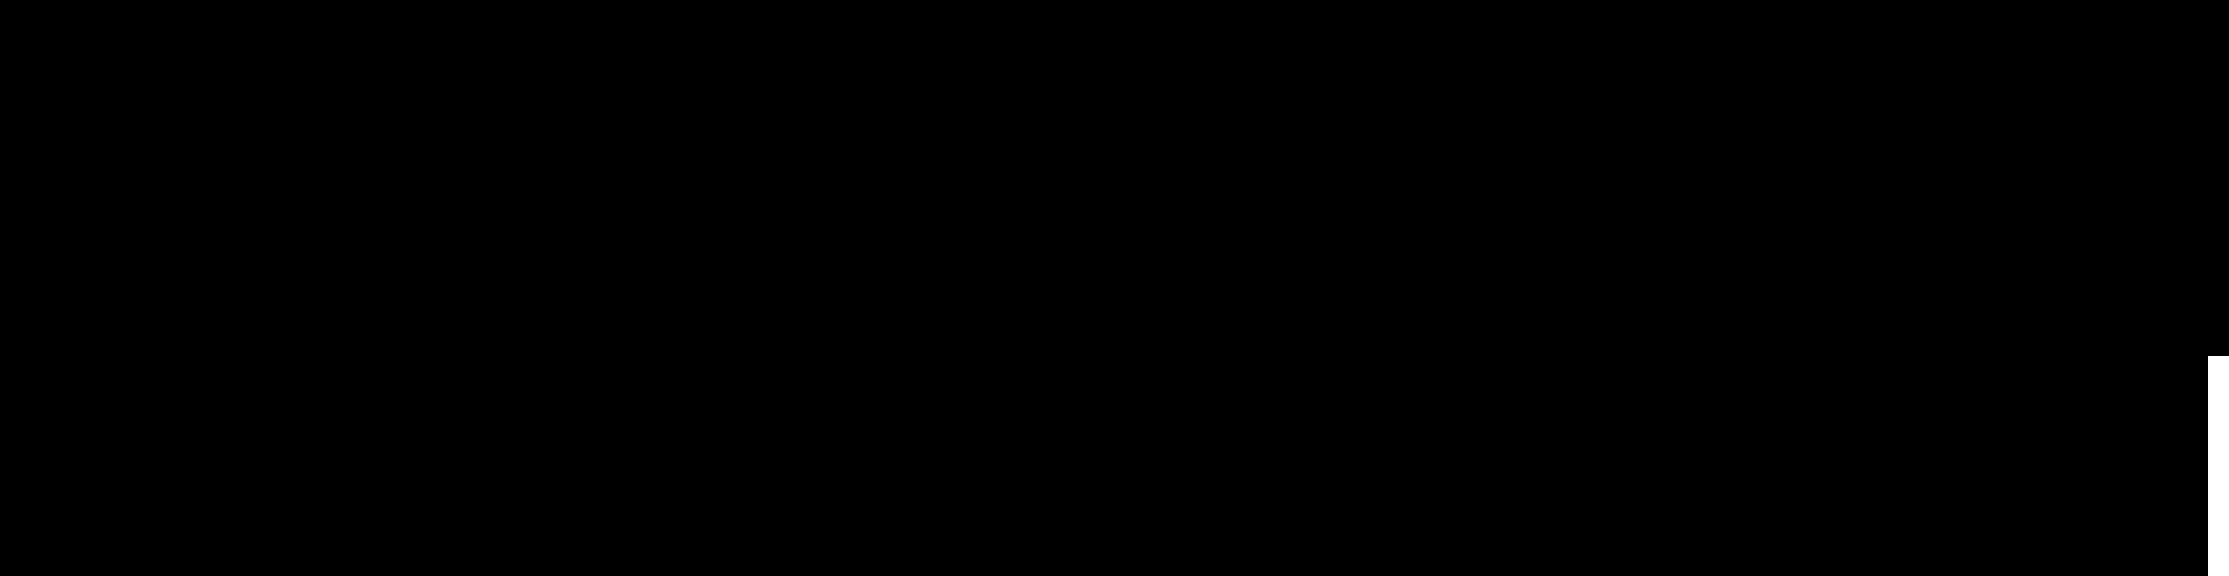 Redbulletin-1